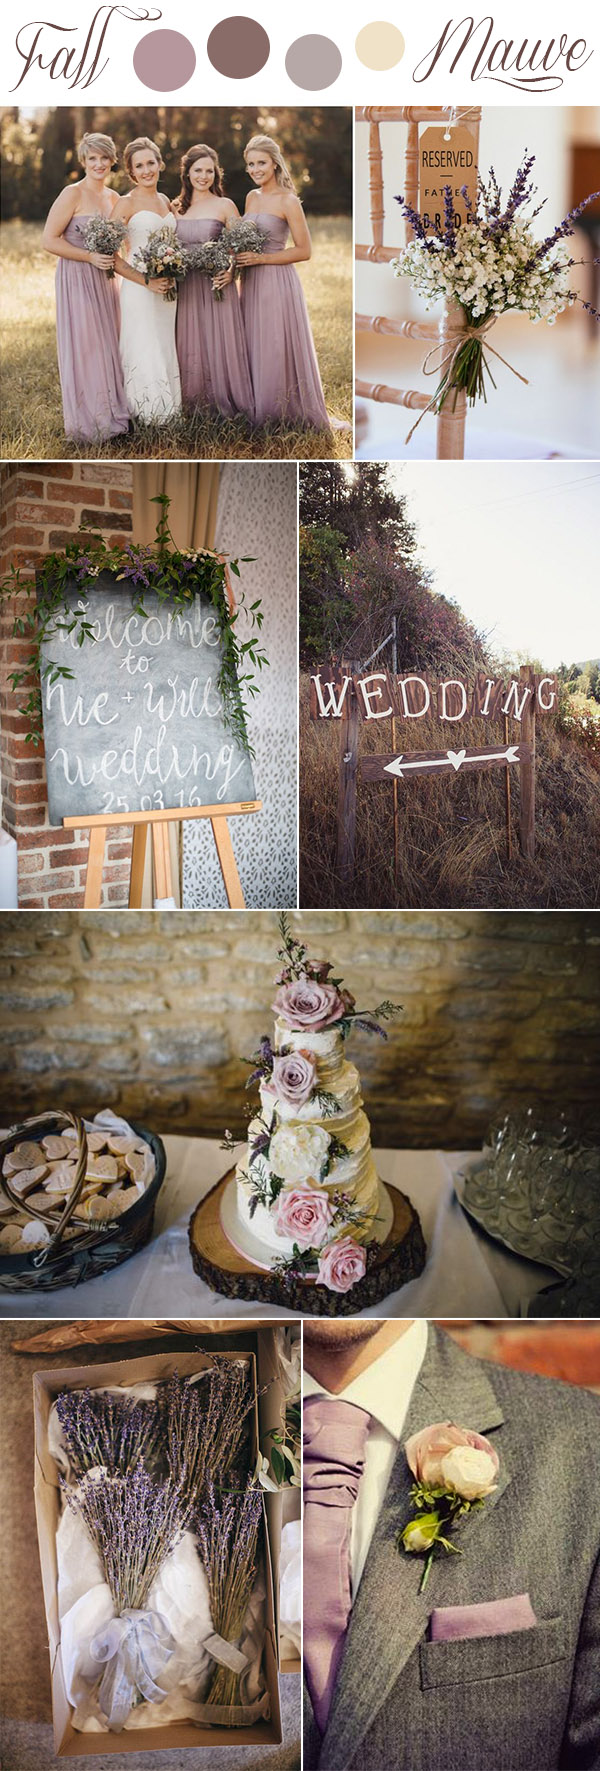 7 Gorgeous Rustic Romantic and Elegant Wedding Ideas